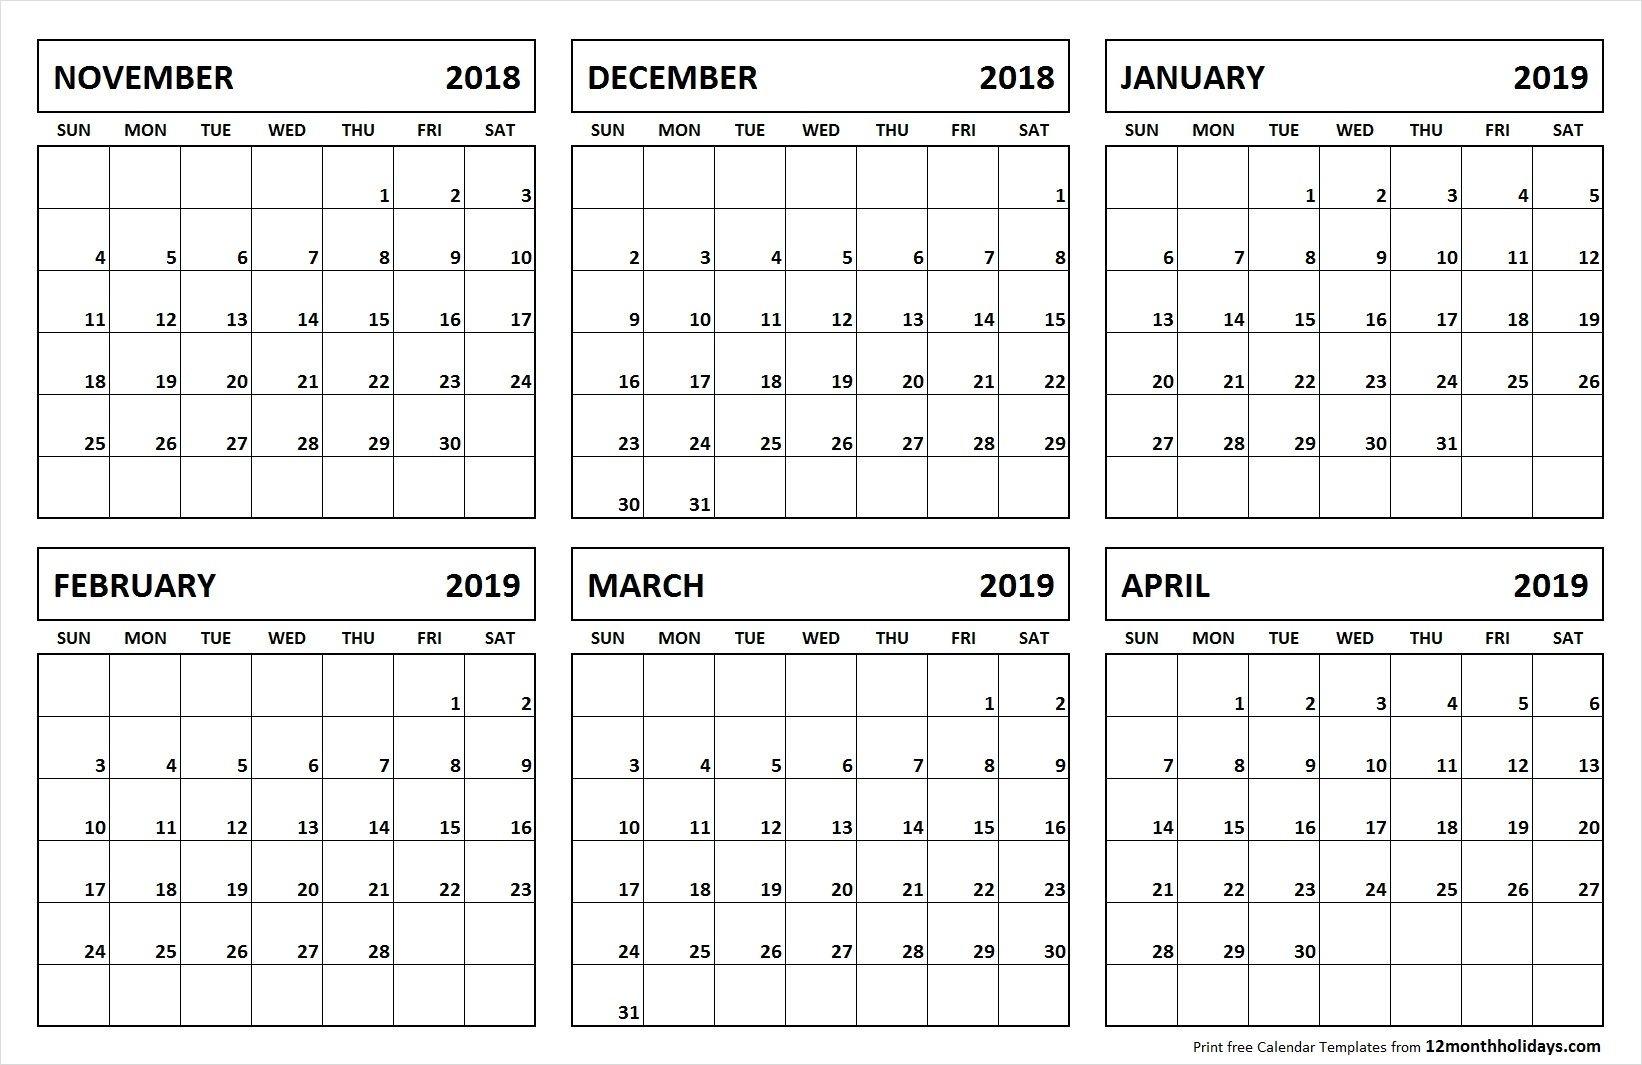 65E42 Printable Calendar 6 Months Per Page C Template